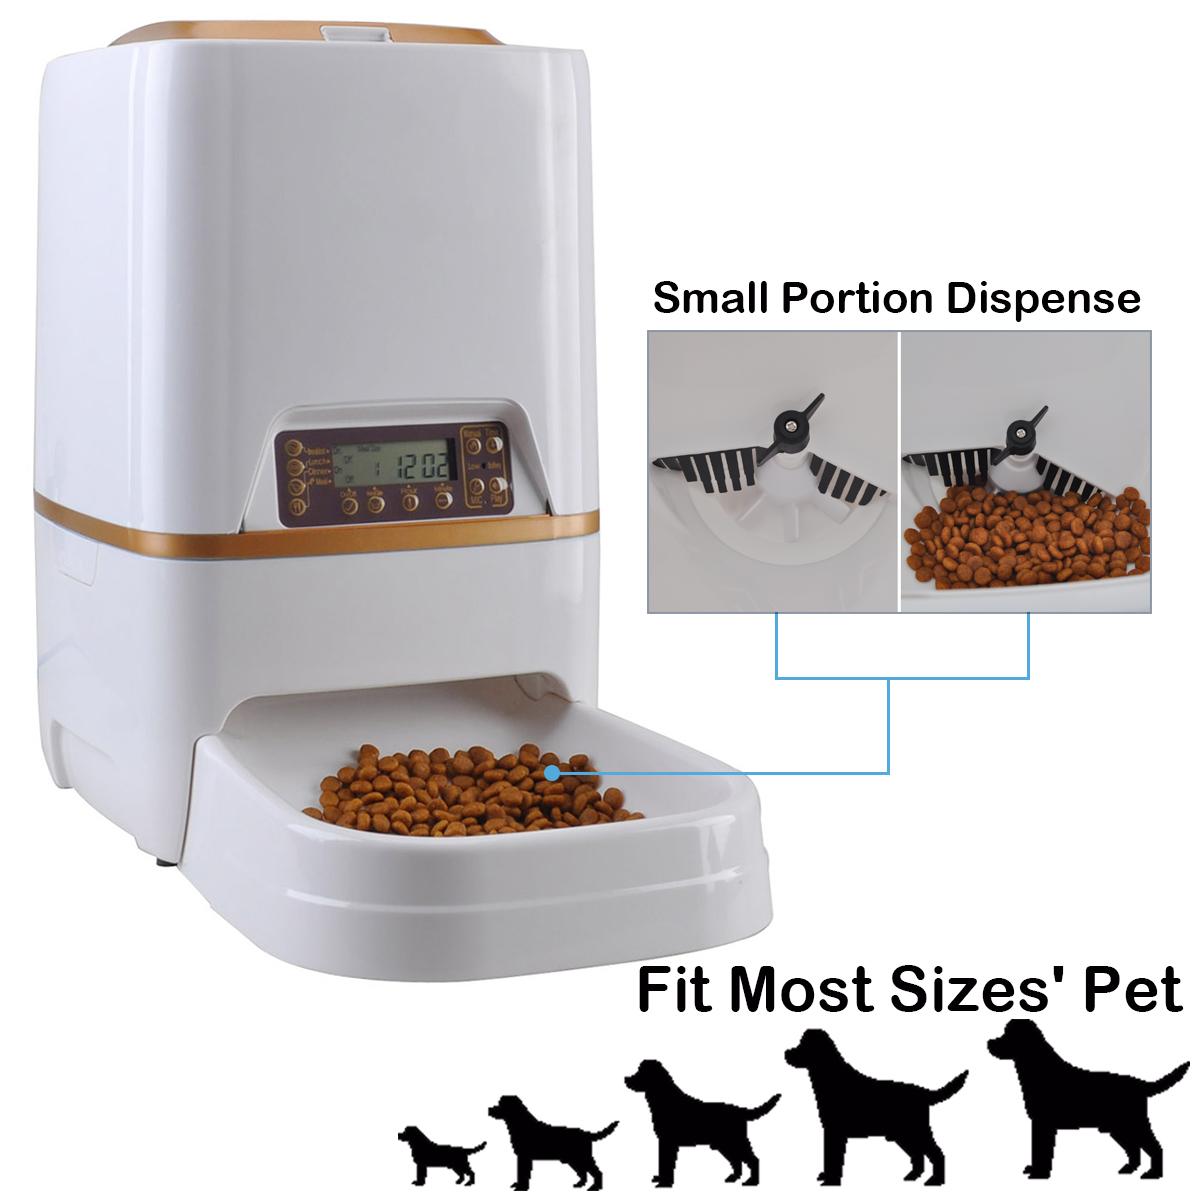 Mascotas Automatico Dispensador De Comida Perro Gato Alimentador Programable Casa Grabadora De Voz 6l Ebay